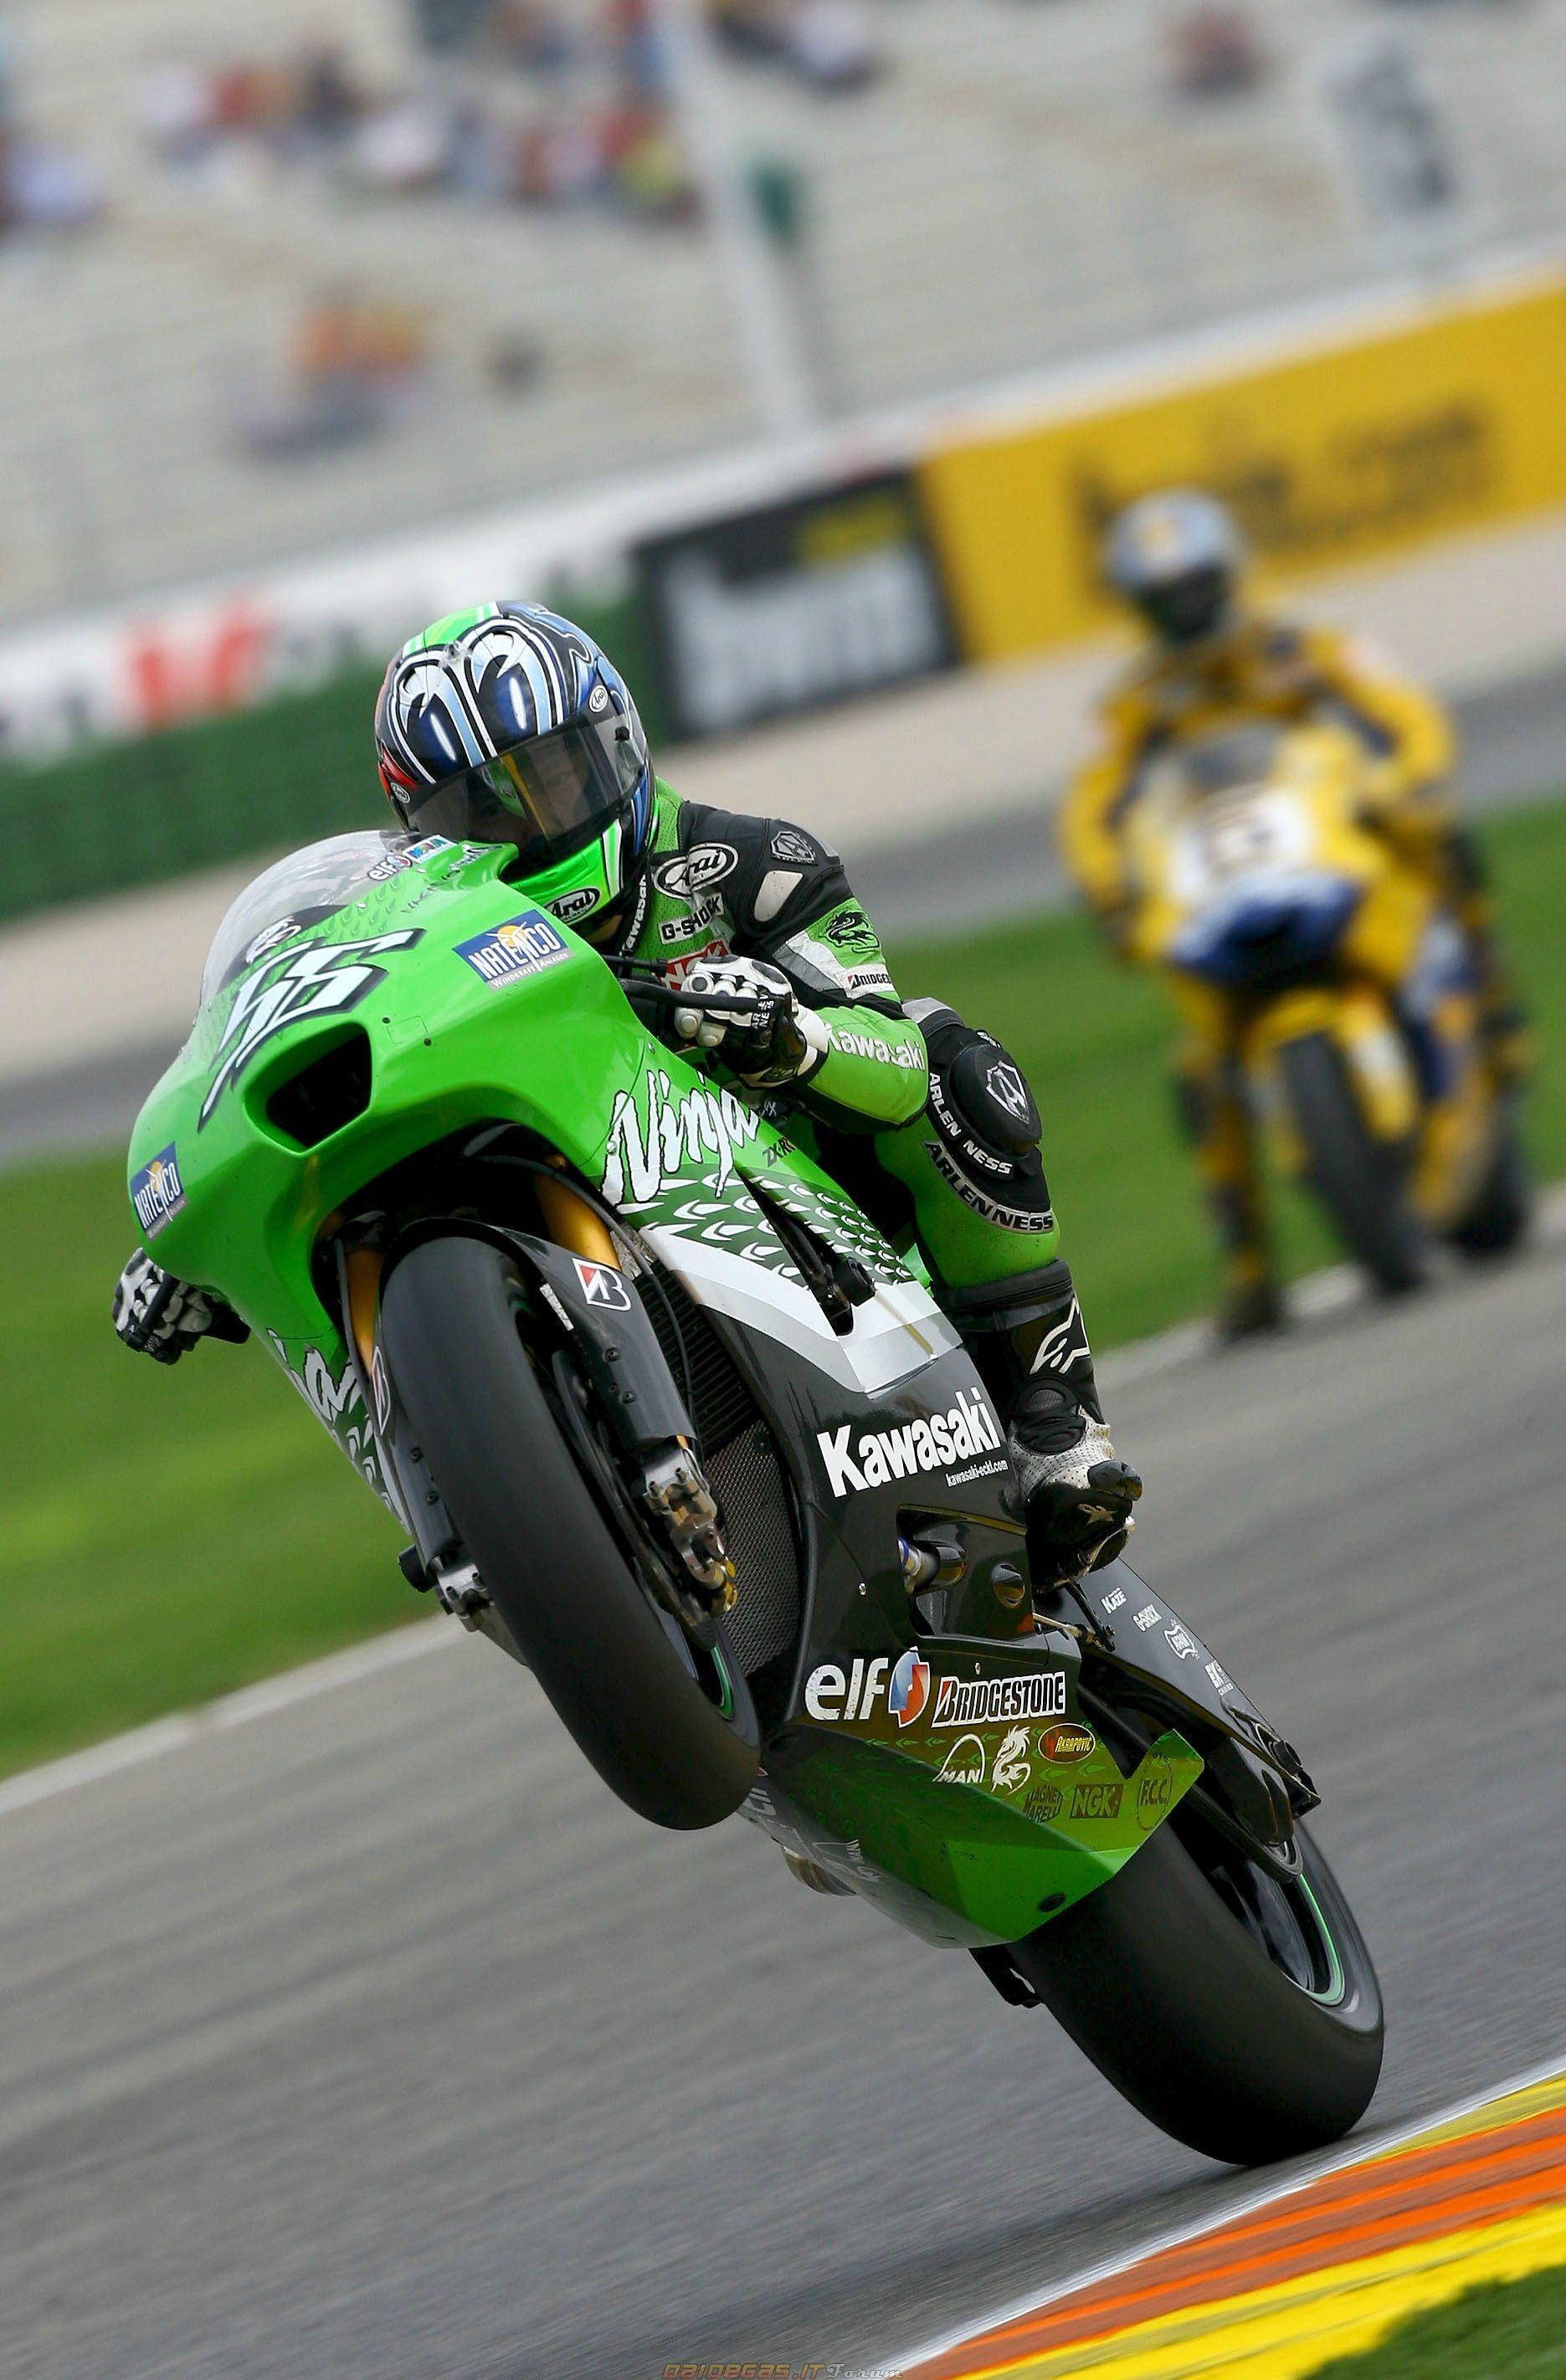 Shinya Nakano Kawasaki Zx Rr 2005 Nori Kawasaki Bikes Racing Bikes Super Bikes